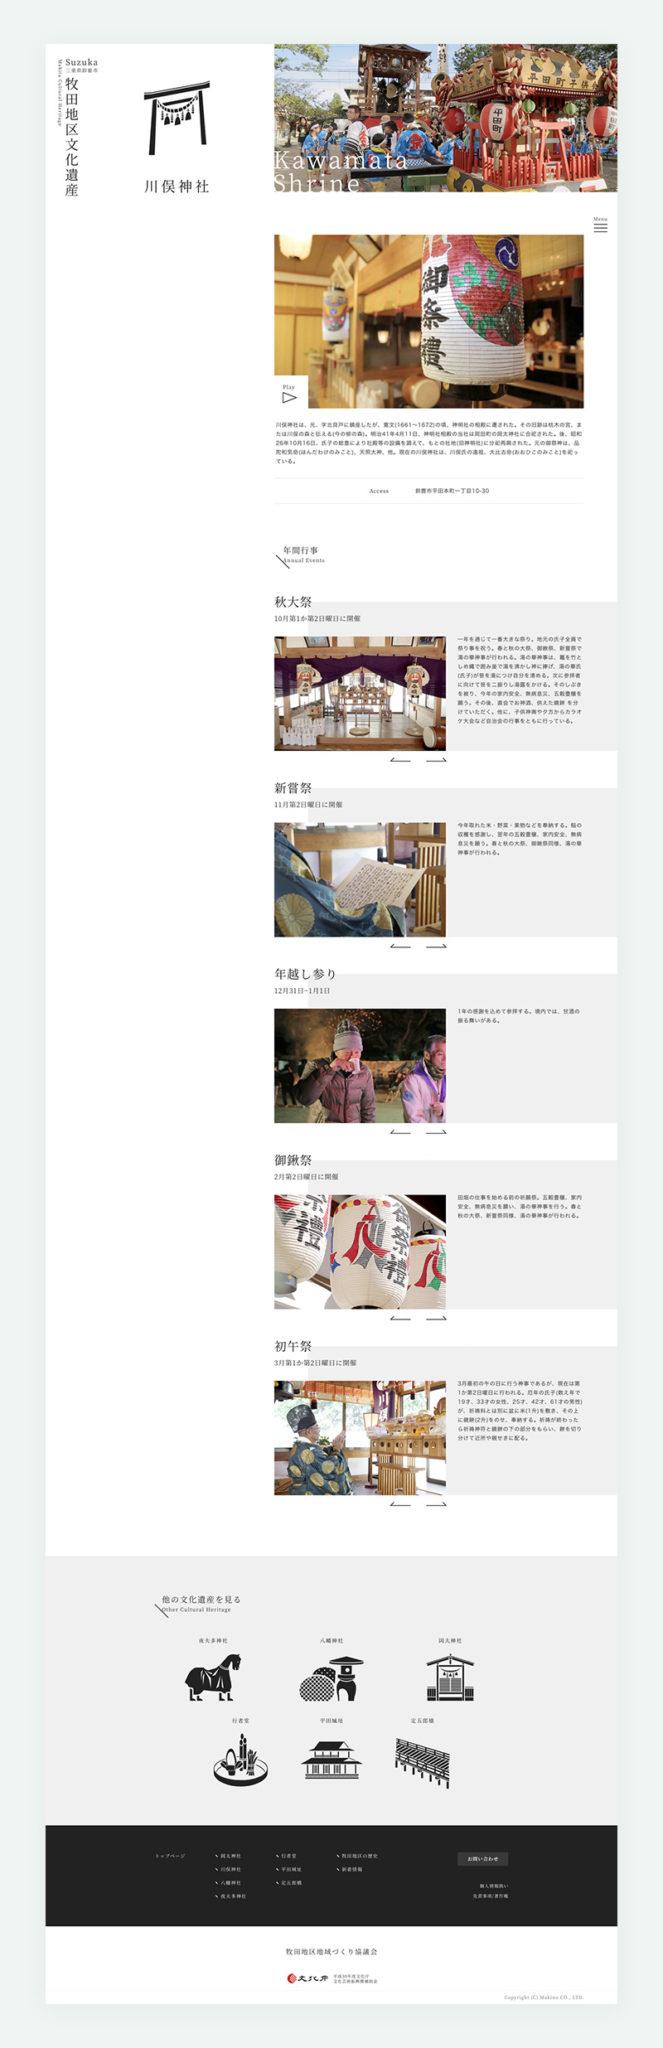 牧田地区文化遺産 Webページ